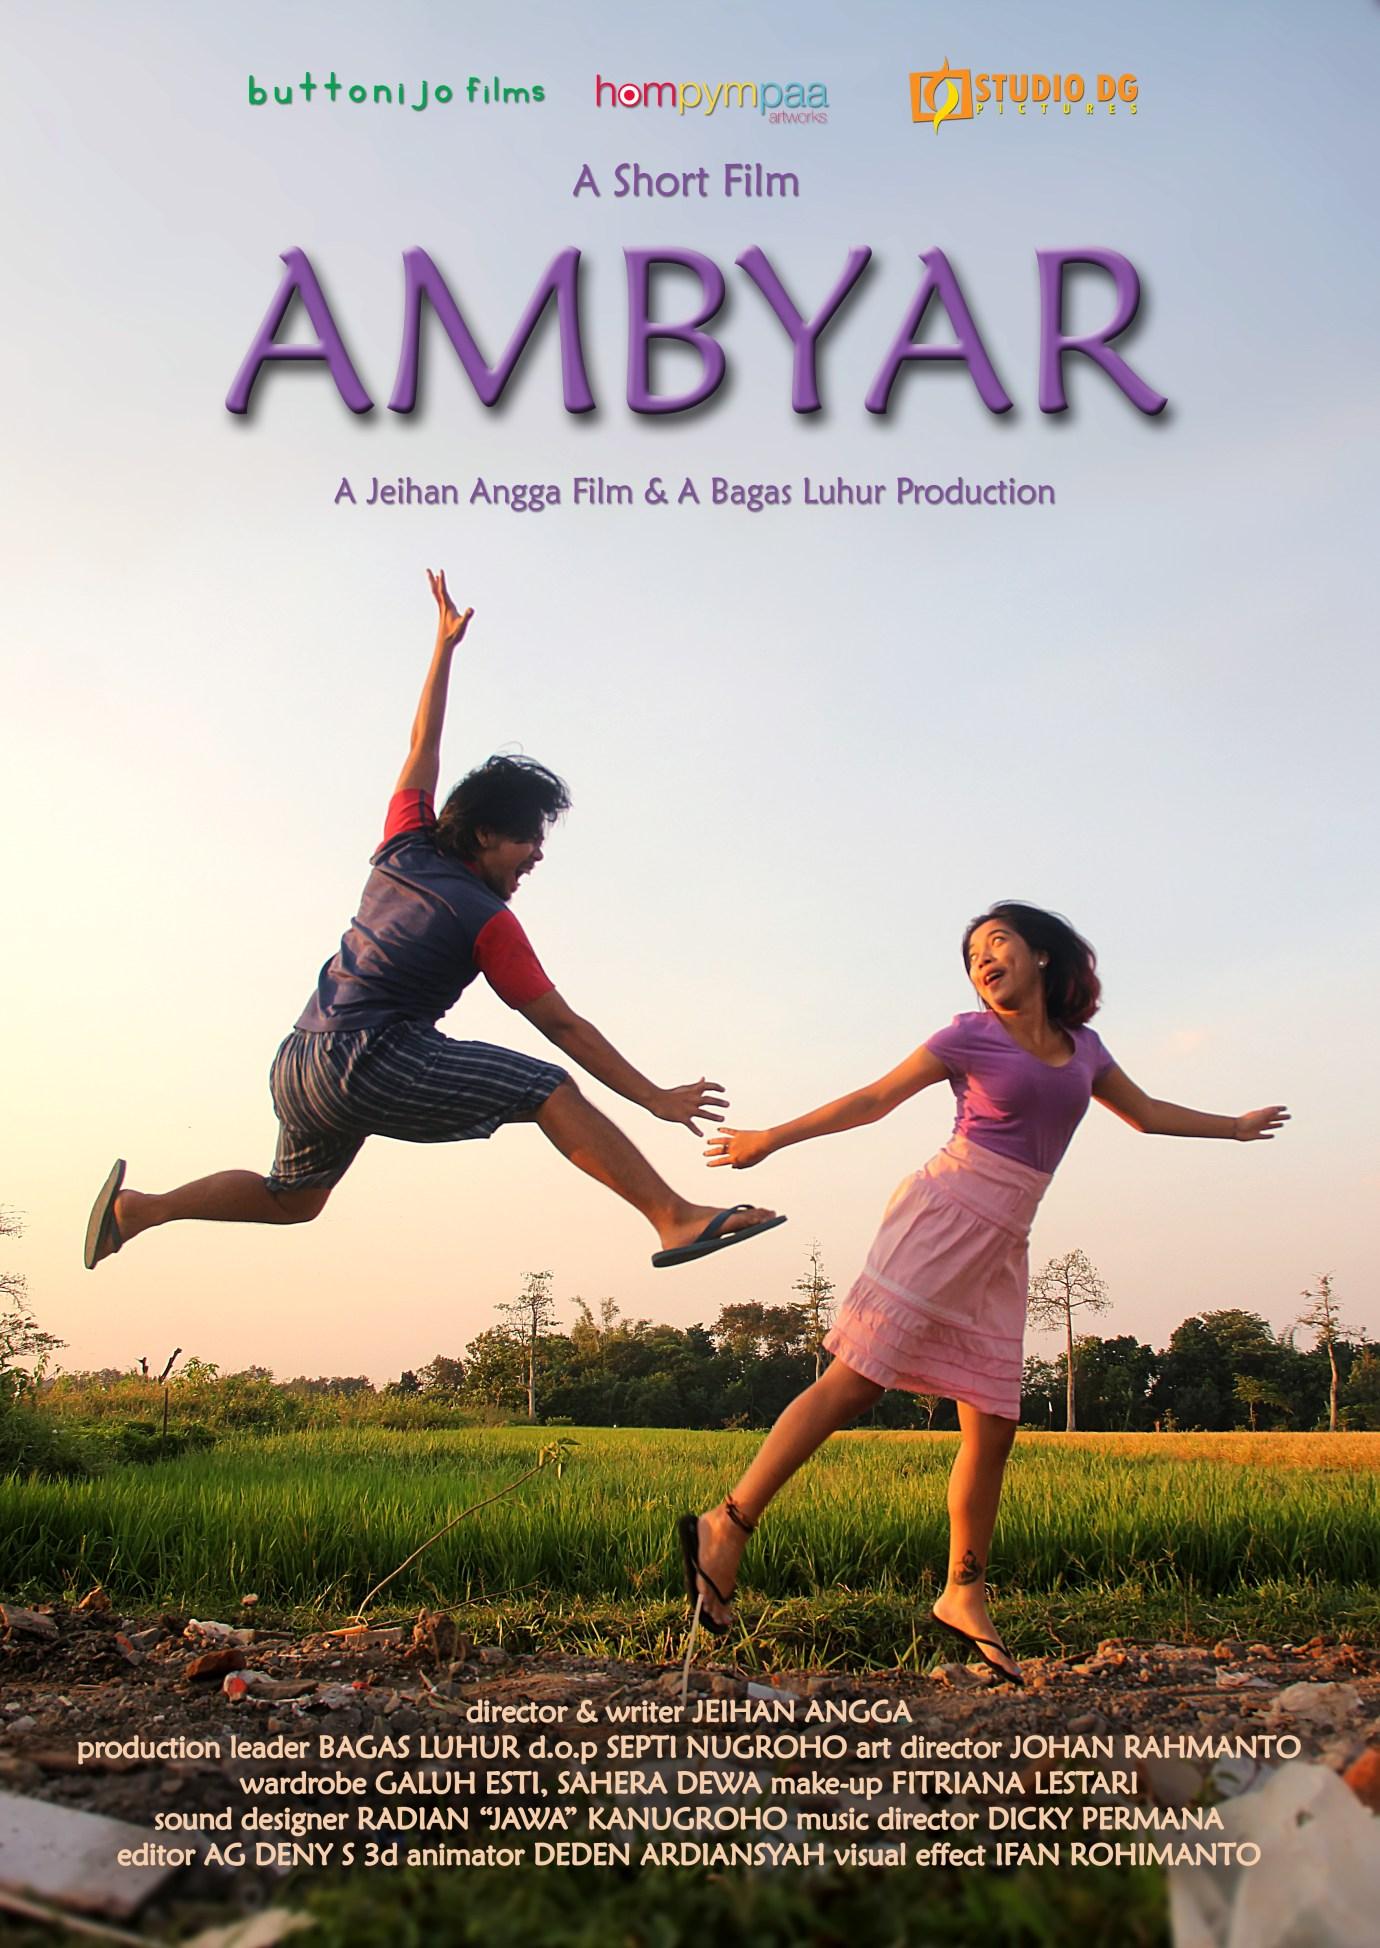 Ambyar 2015 Imdb